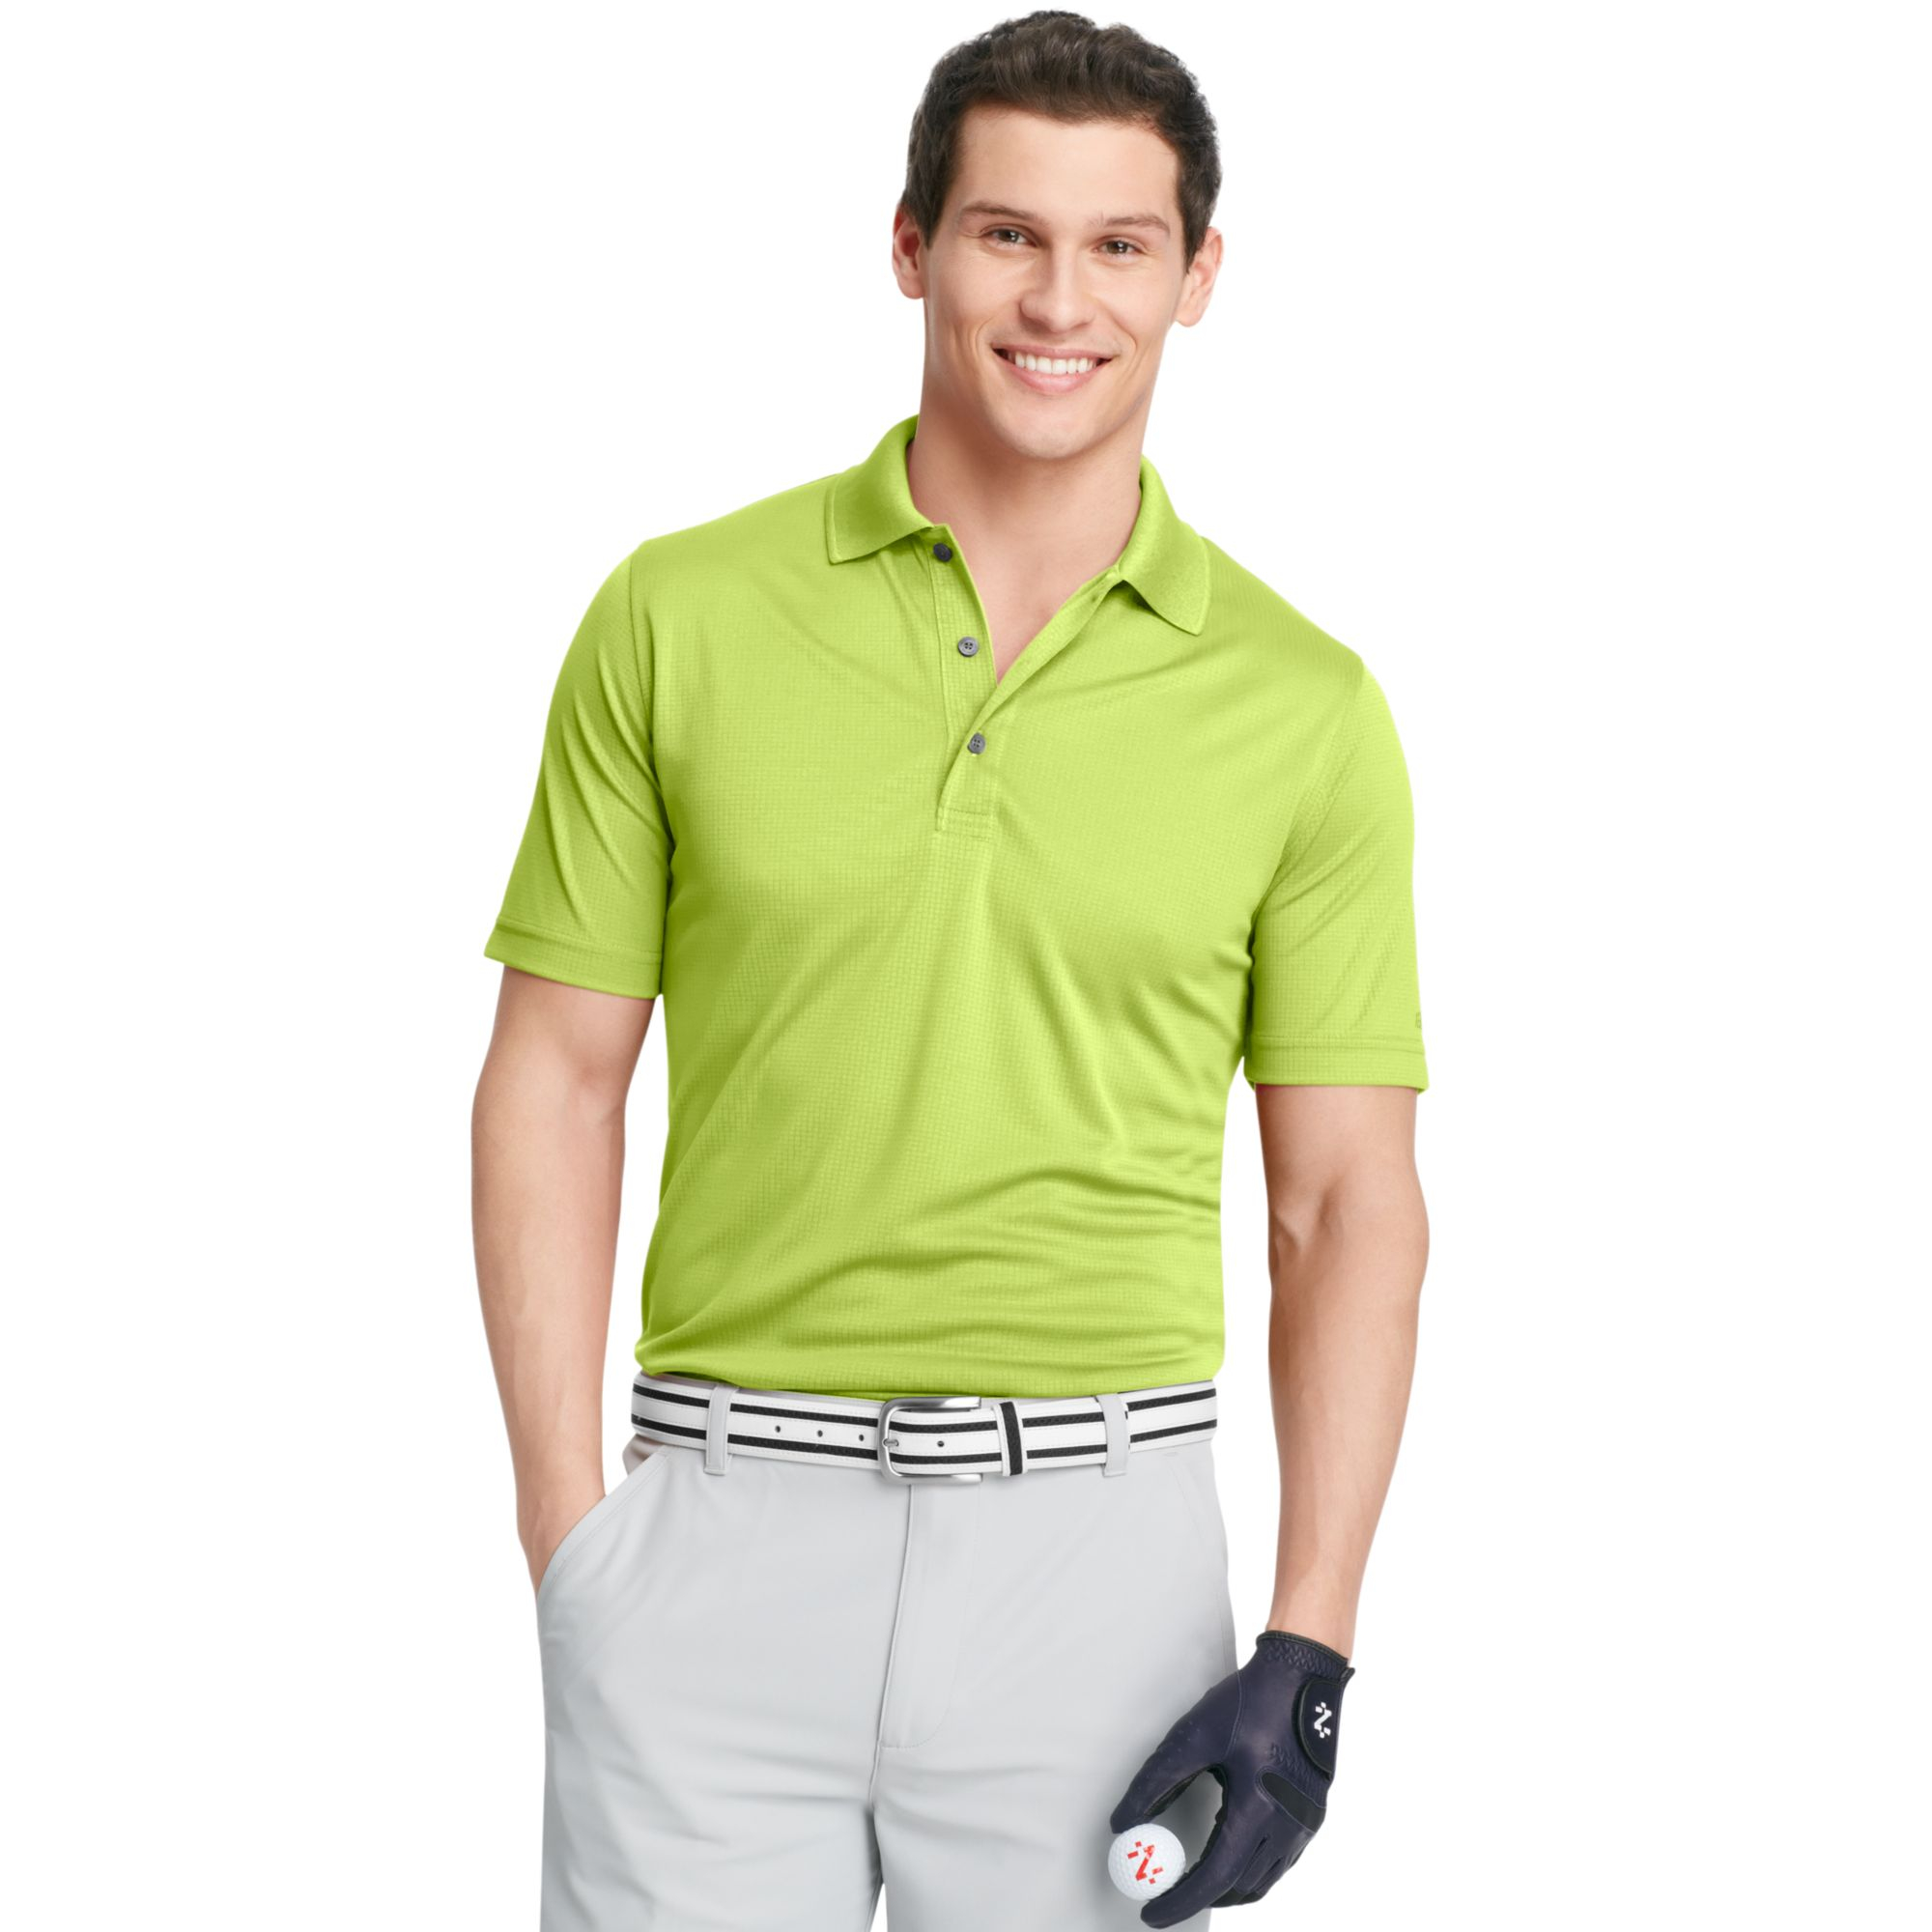 quite nice promotion new items Womens Izod Golf Shirts   RLDM